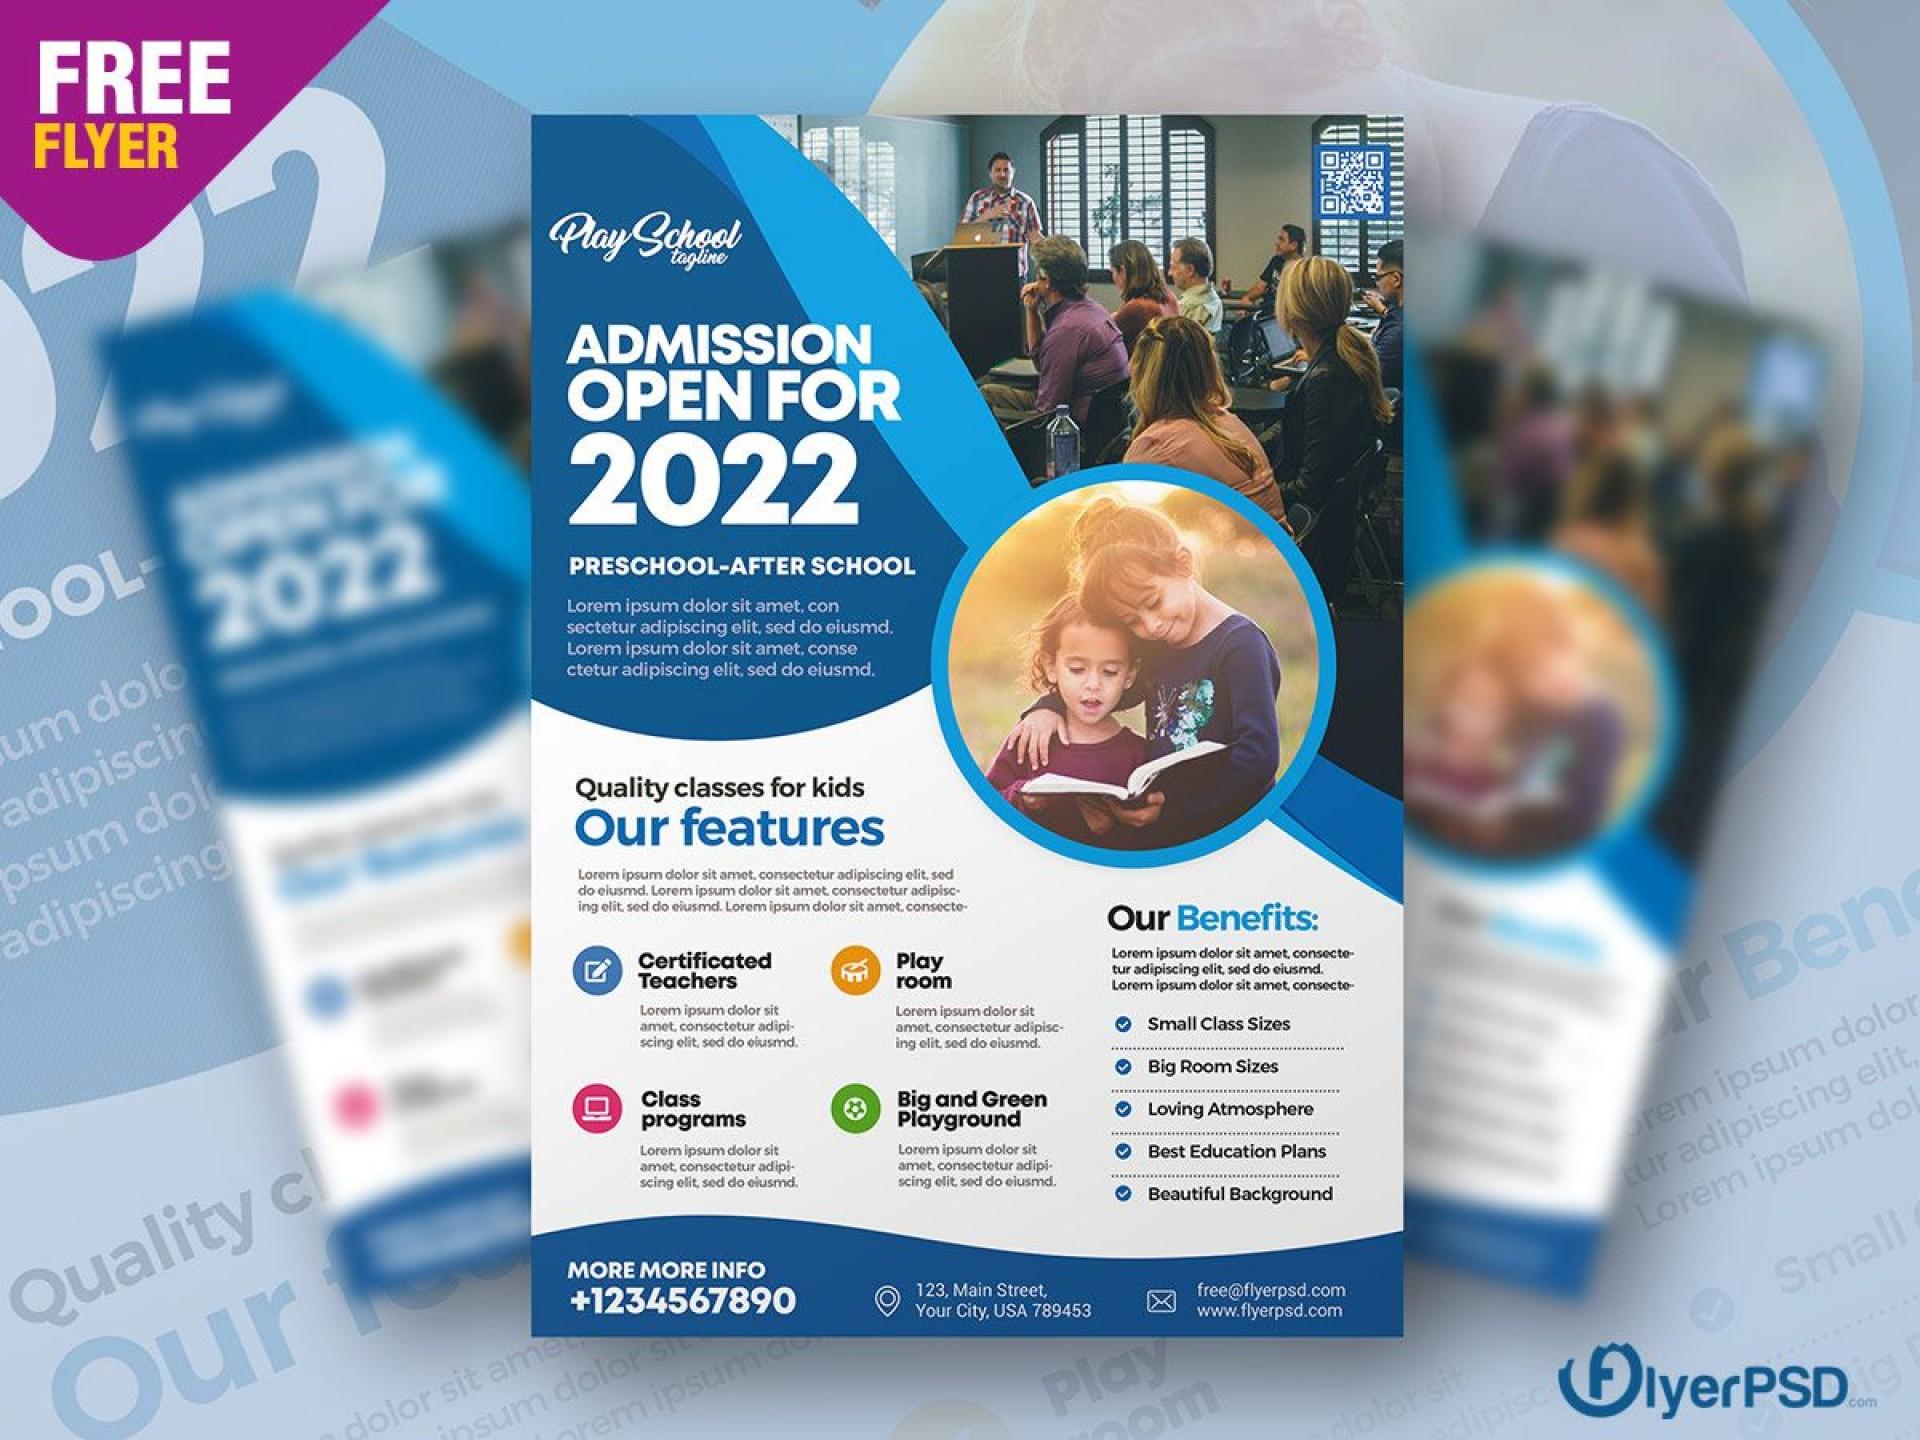 008 Beautiful Free School Flyer Design Template Concept  Templates Creative Education Poster1920